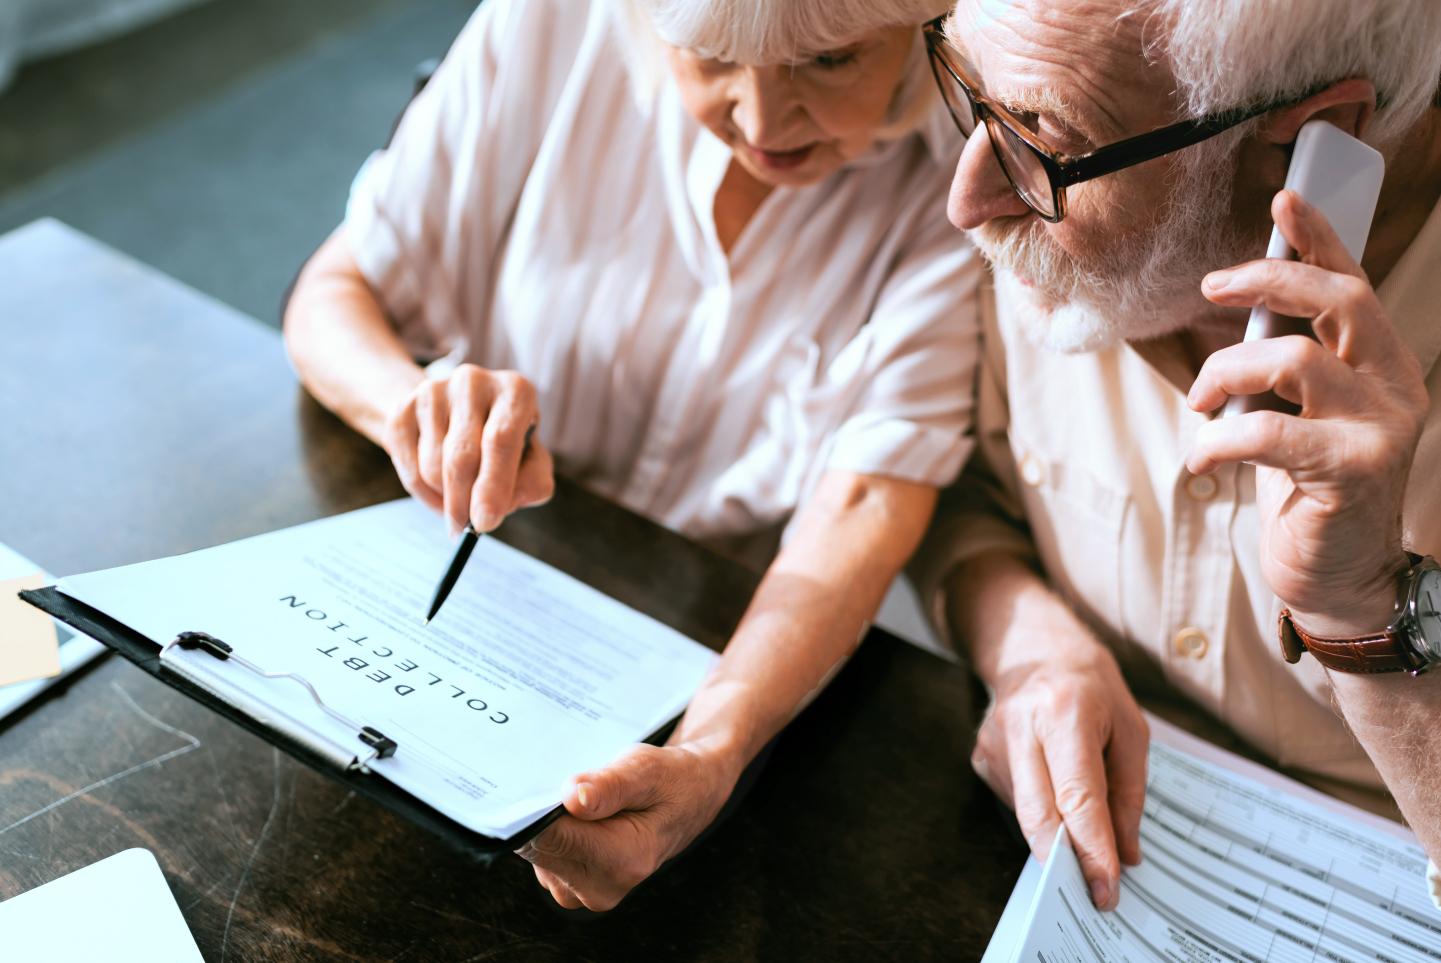 Elderly man on phone, woman holding paperwork